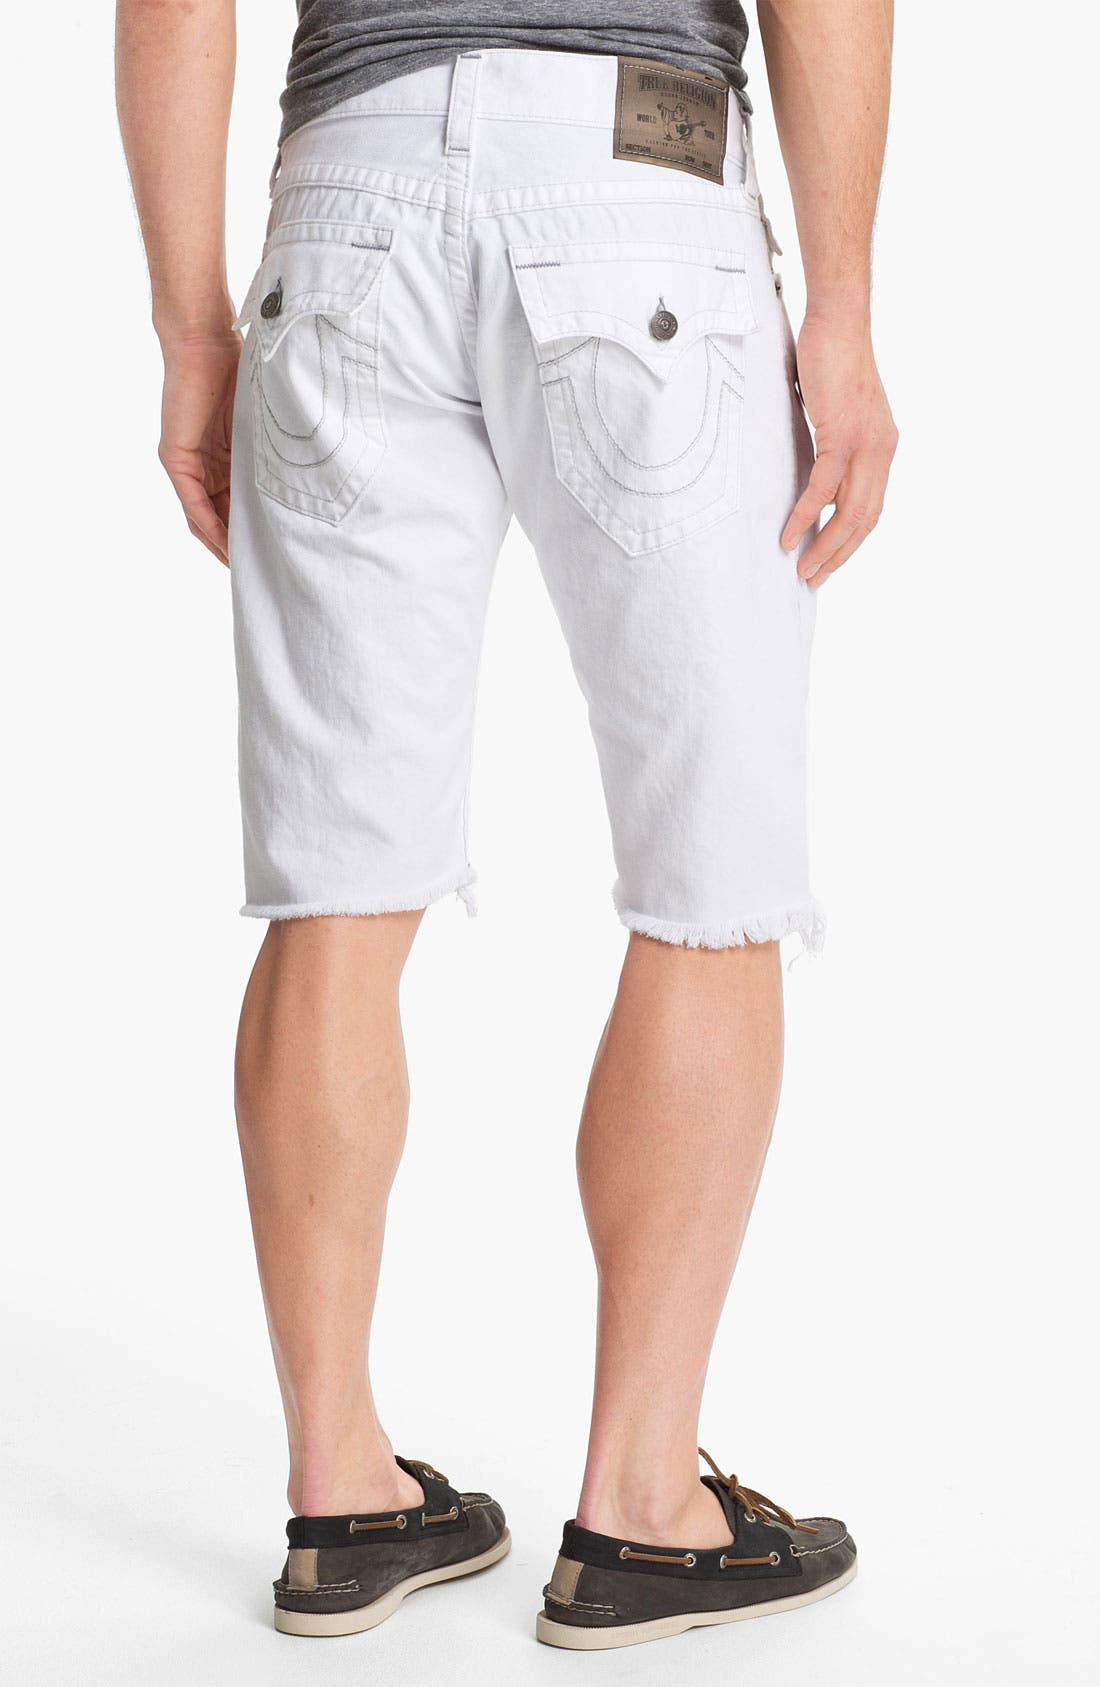 Main Image - True Religion Brand Jeans 'Ricky' Cutoff Denim Shorts